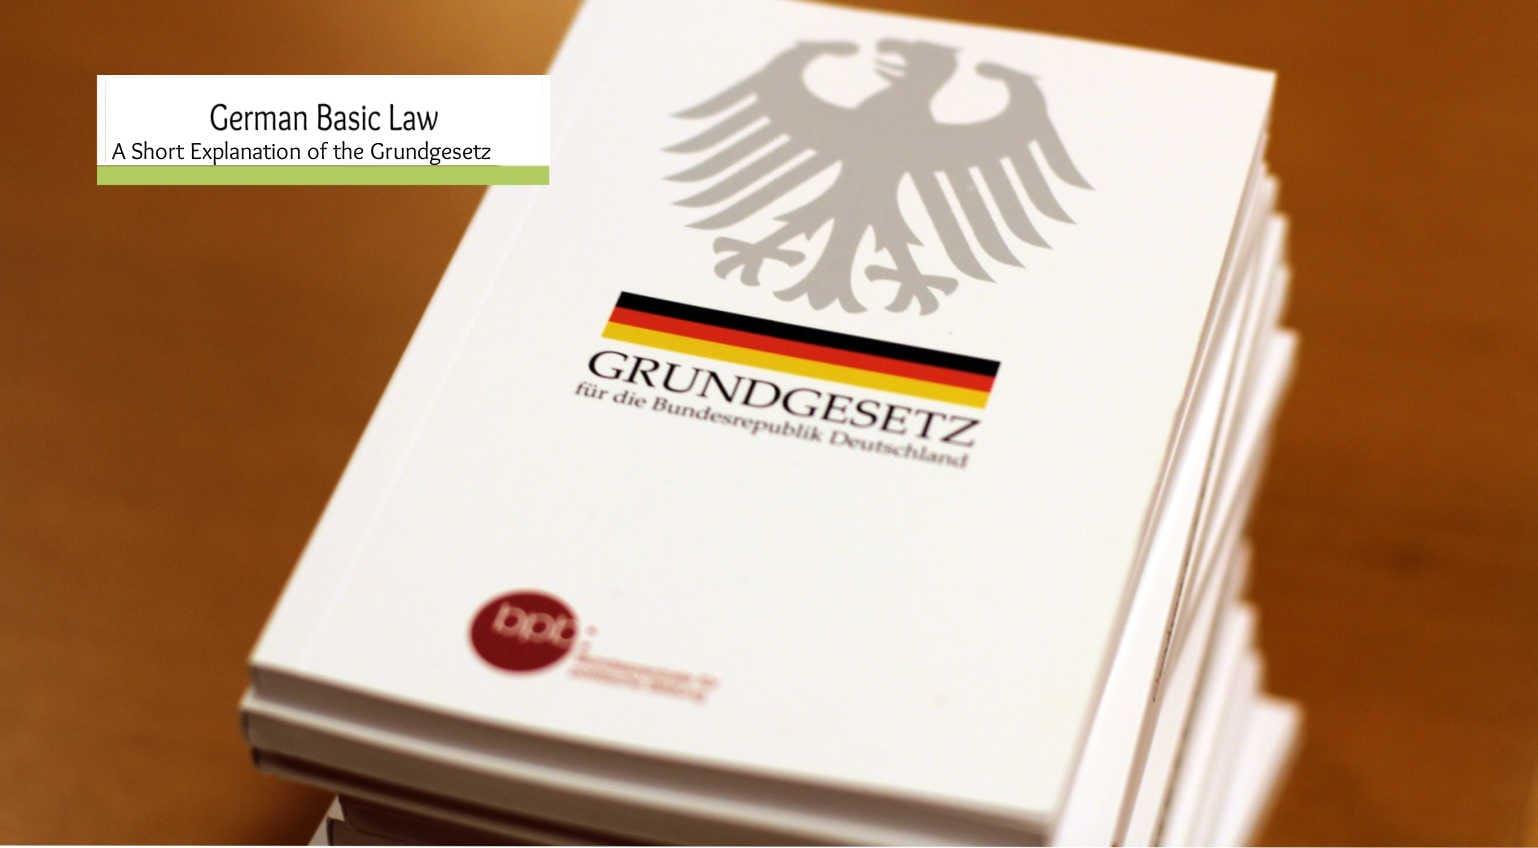 German Basic Law – A short explanation of the Grundgesetz